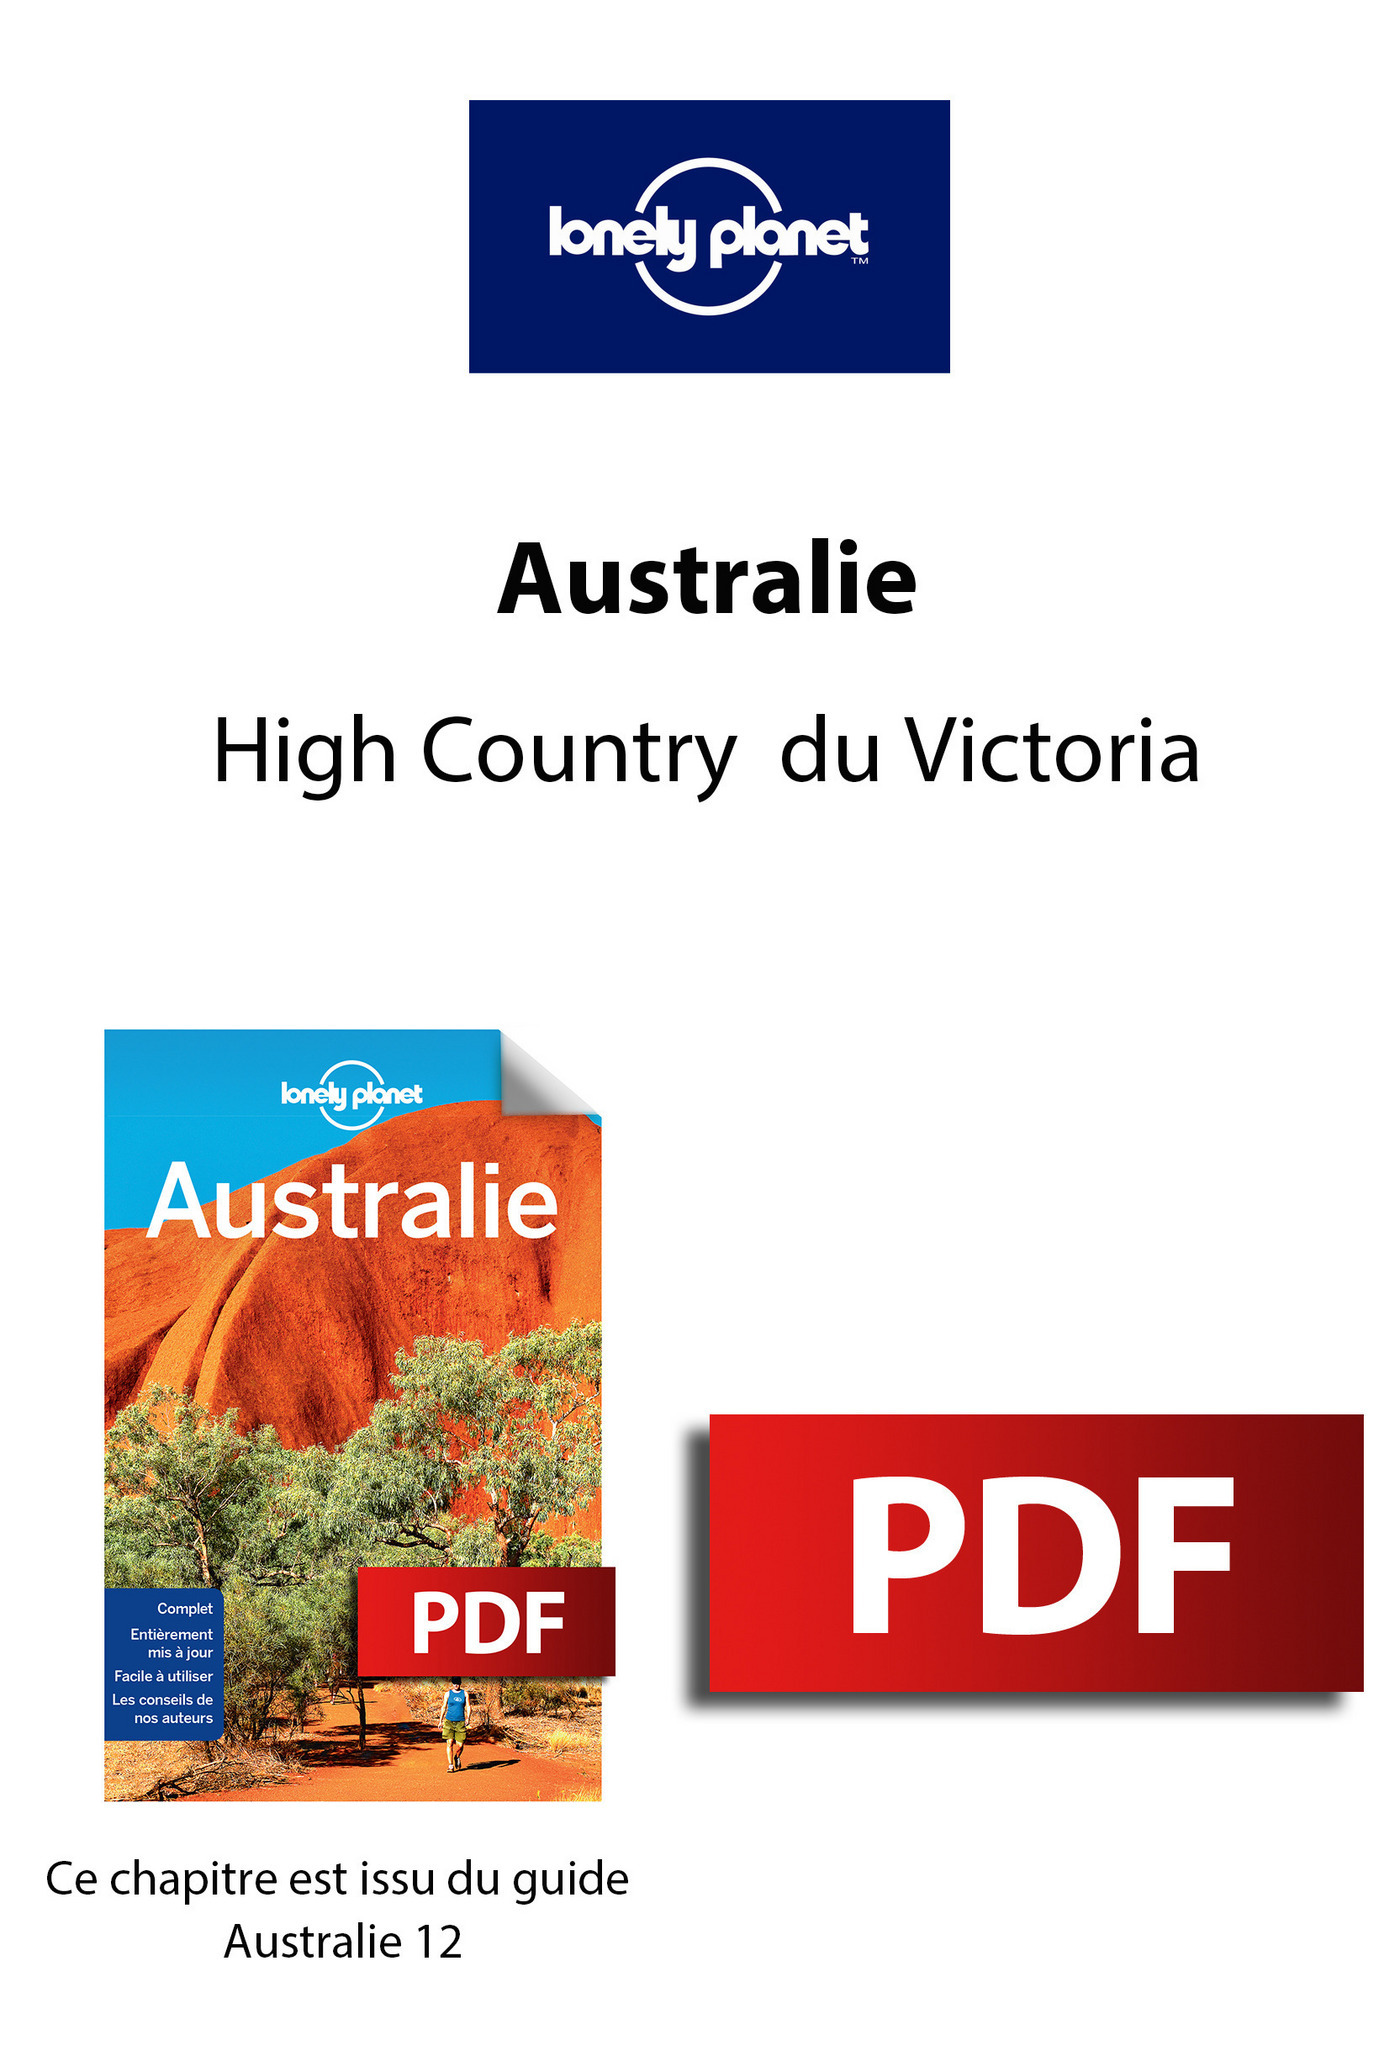 Australie - High Country du Victoria